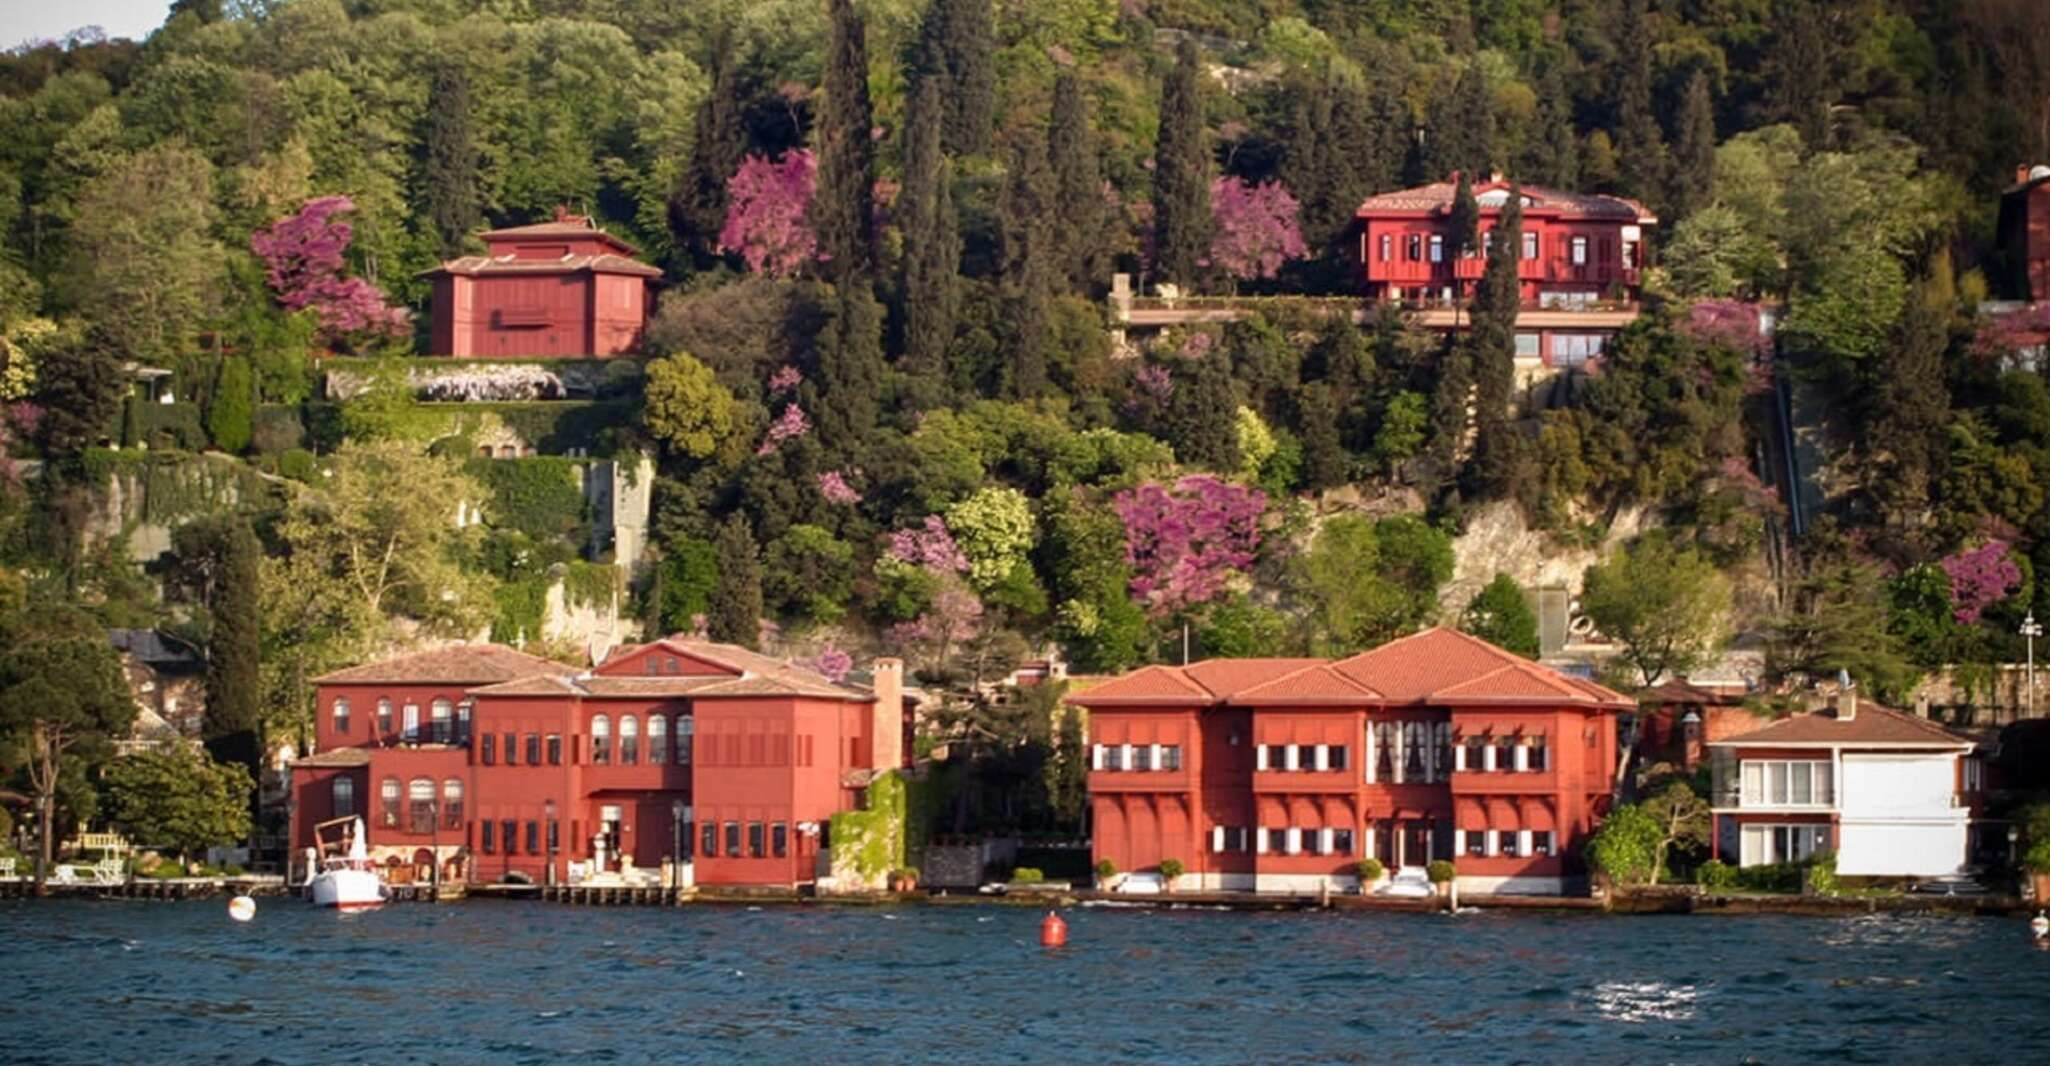 Istanbul: Spice Bazaar Tour and Bosphorus Morning Cruise